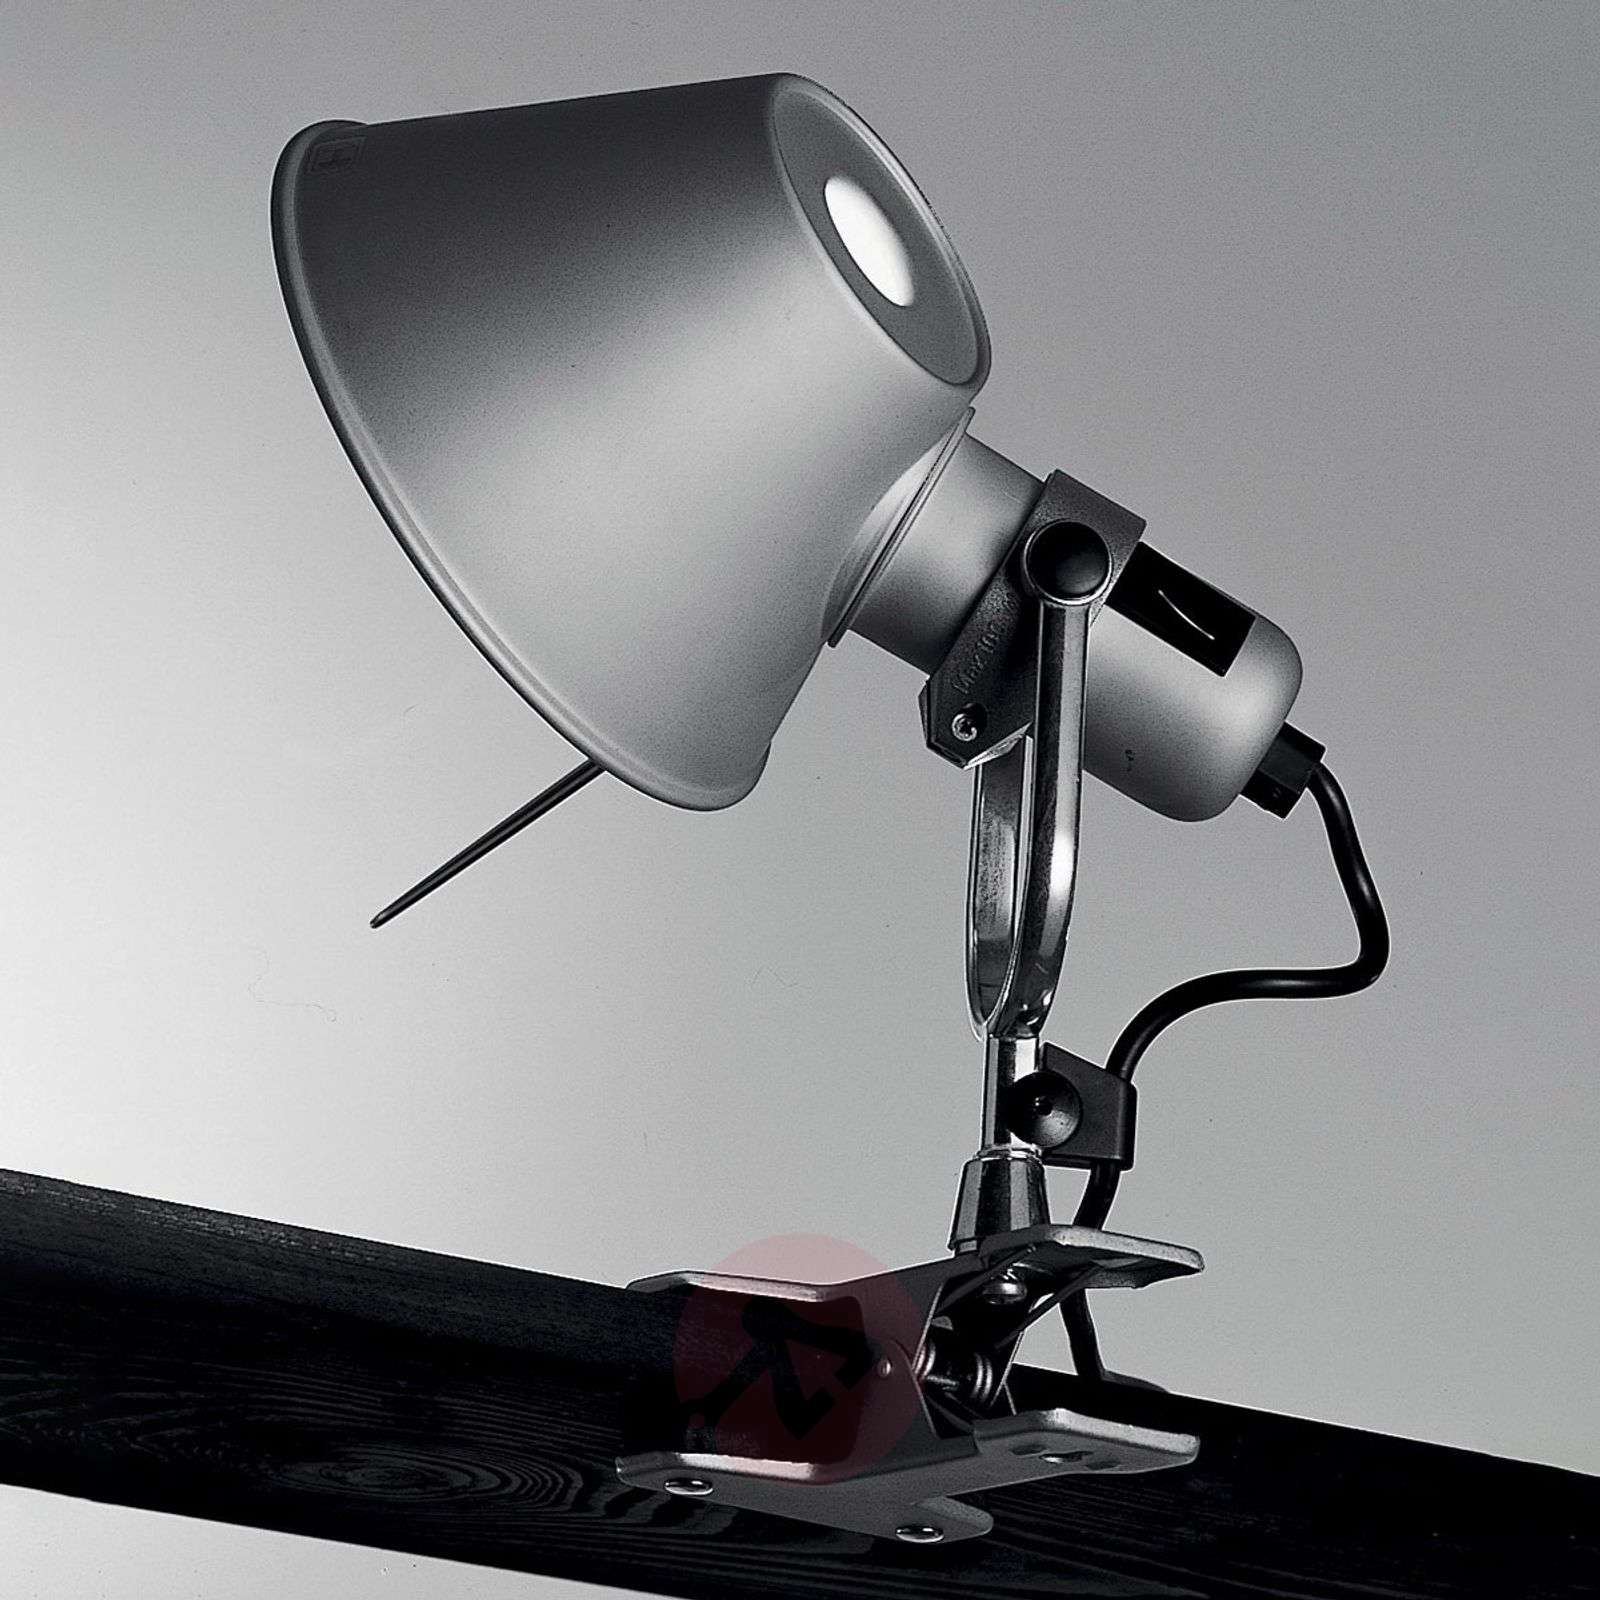 Artemide Tolomeo Pinza LED-klipsivalaisin-1060280X-01